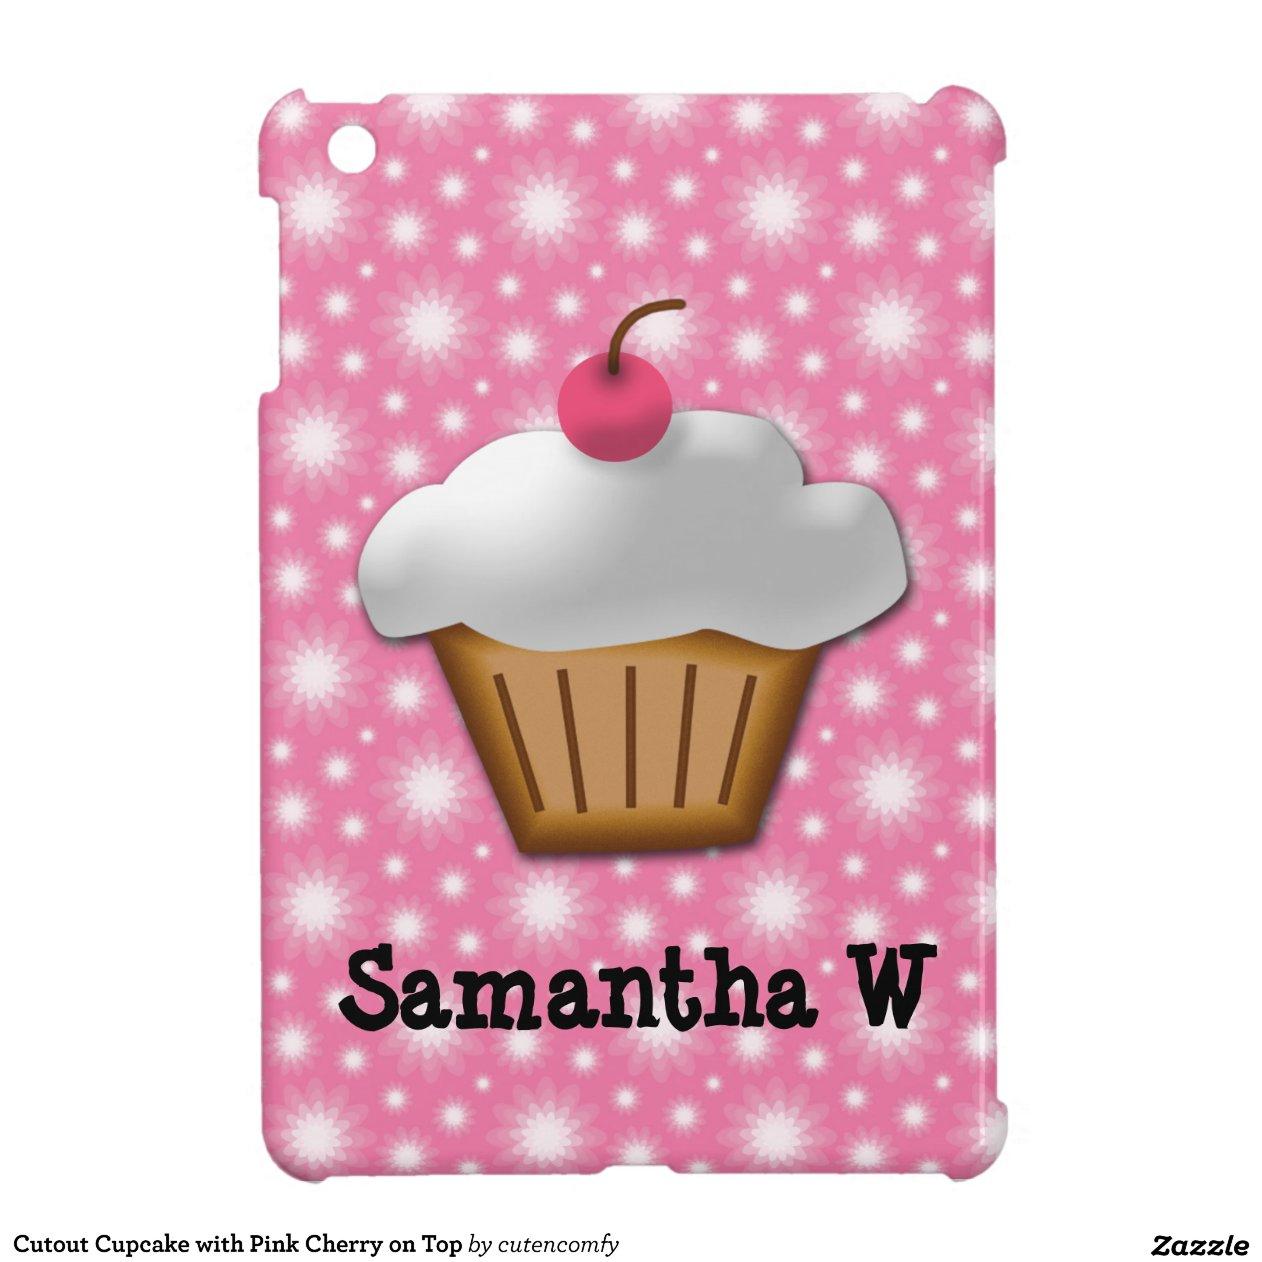 petit g teau de coupe circuit avec la cerise rose coque ipad mini zazzle. Black Bedroom Furniture Sets. Home Design Ideas